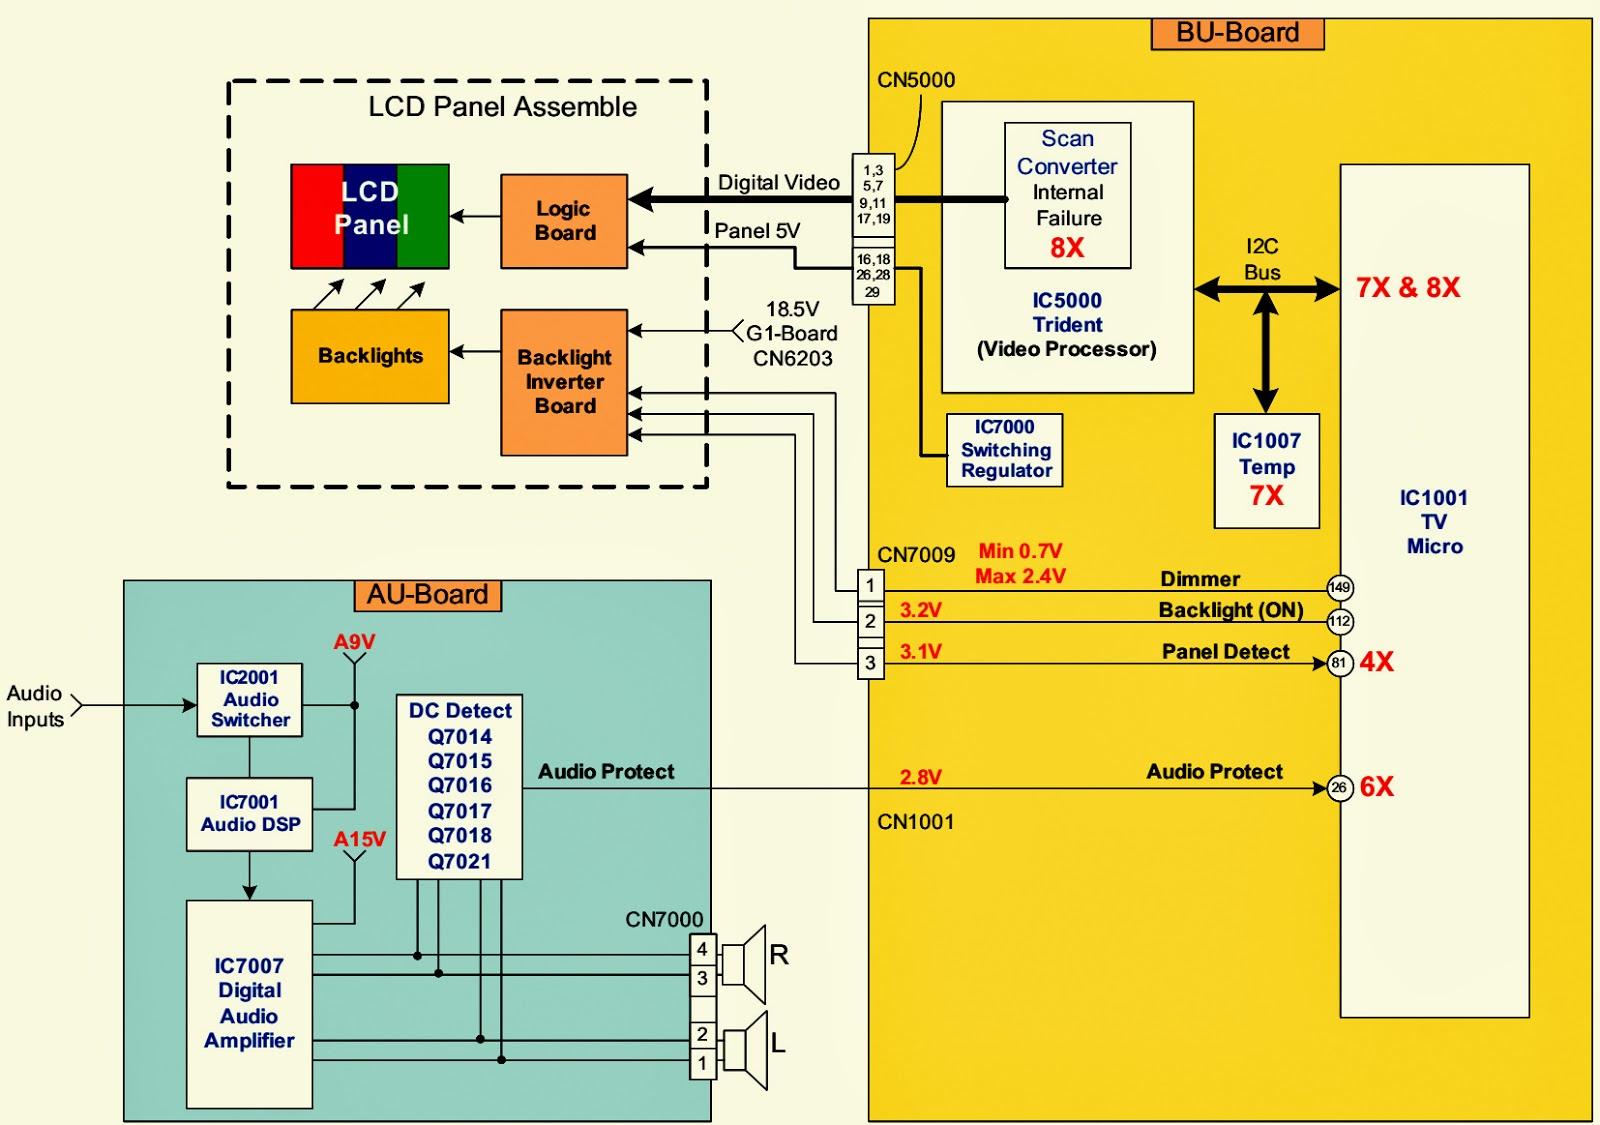 Sony Lcd Tv - St  By Led Blinking  U2013 Fault Detection  U2013 Details - Kdl-26s2000 - Kdl-32s2000